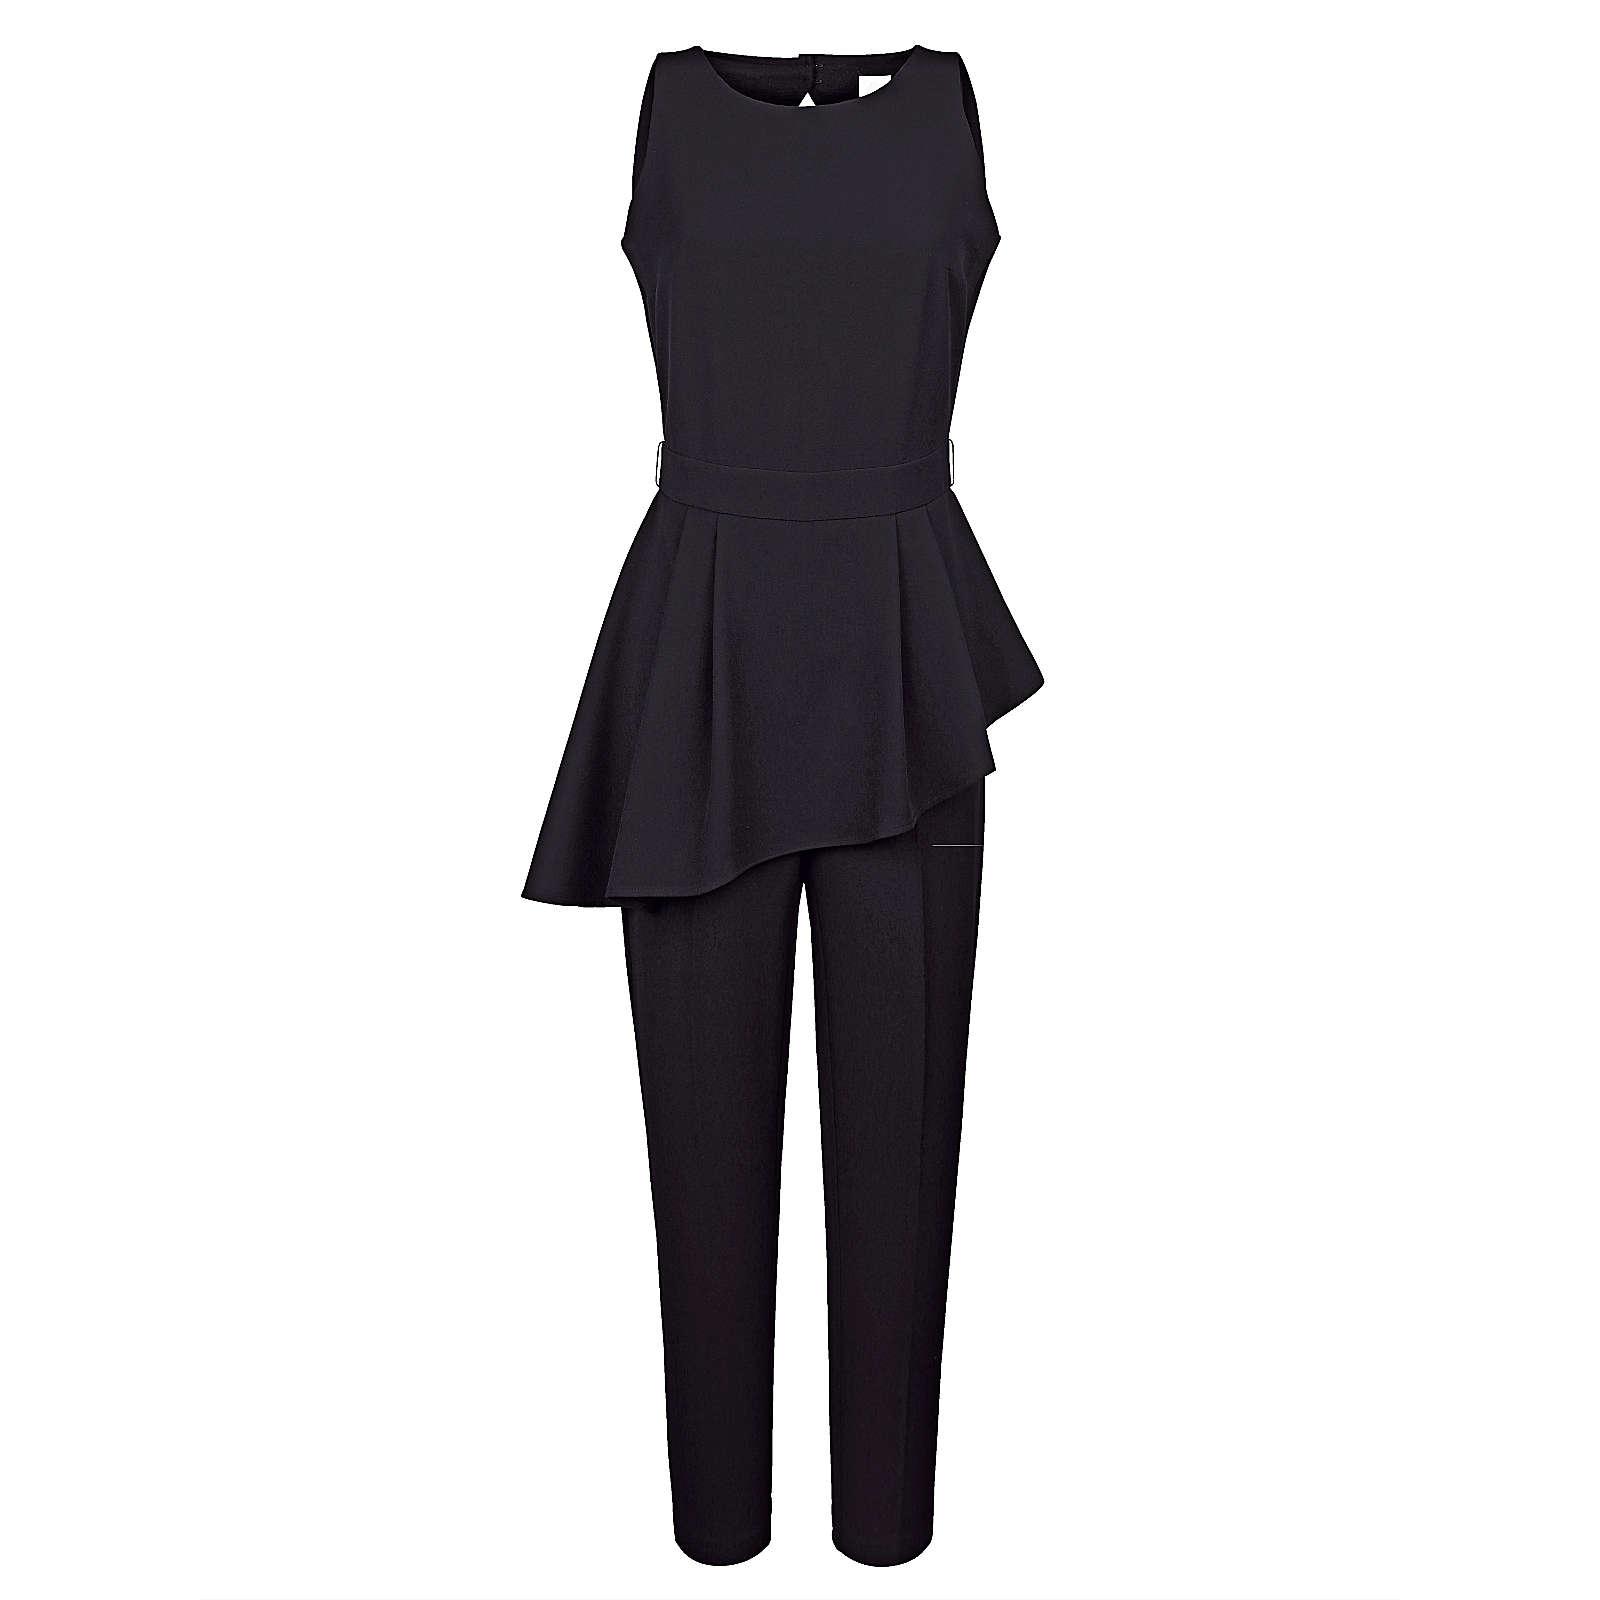 Alba Moda Jumpsuit schwarz Damen Gr. 40